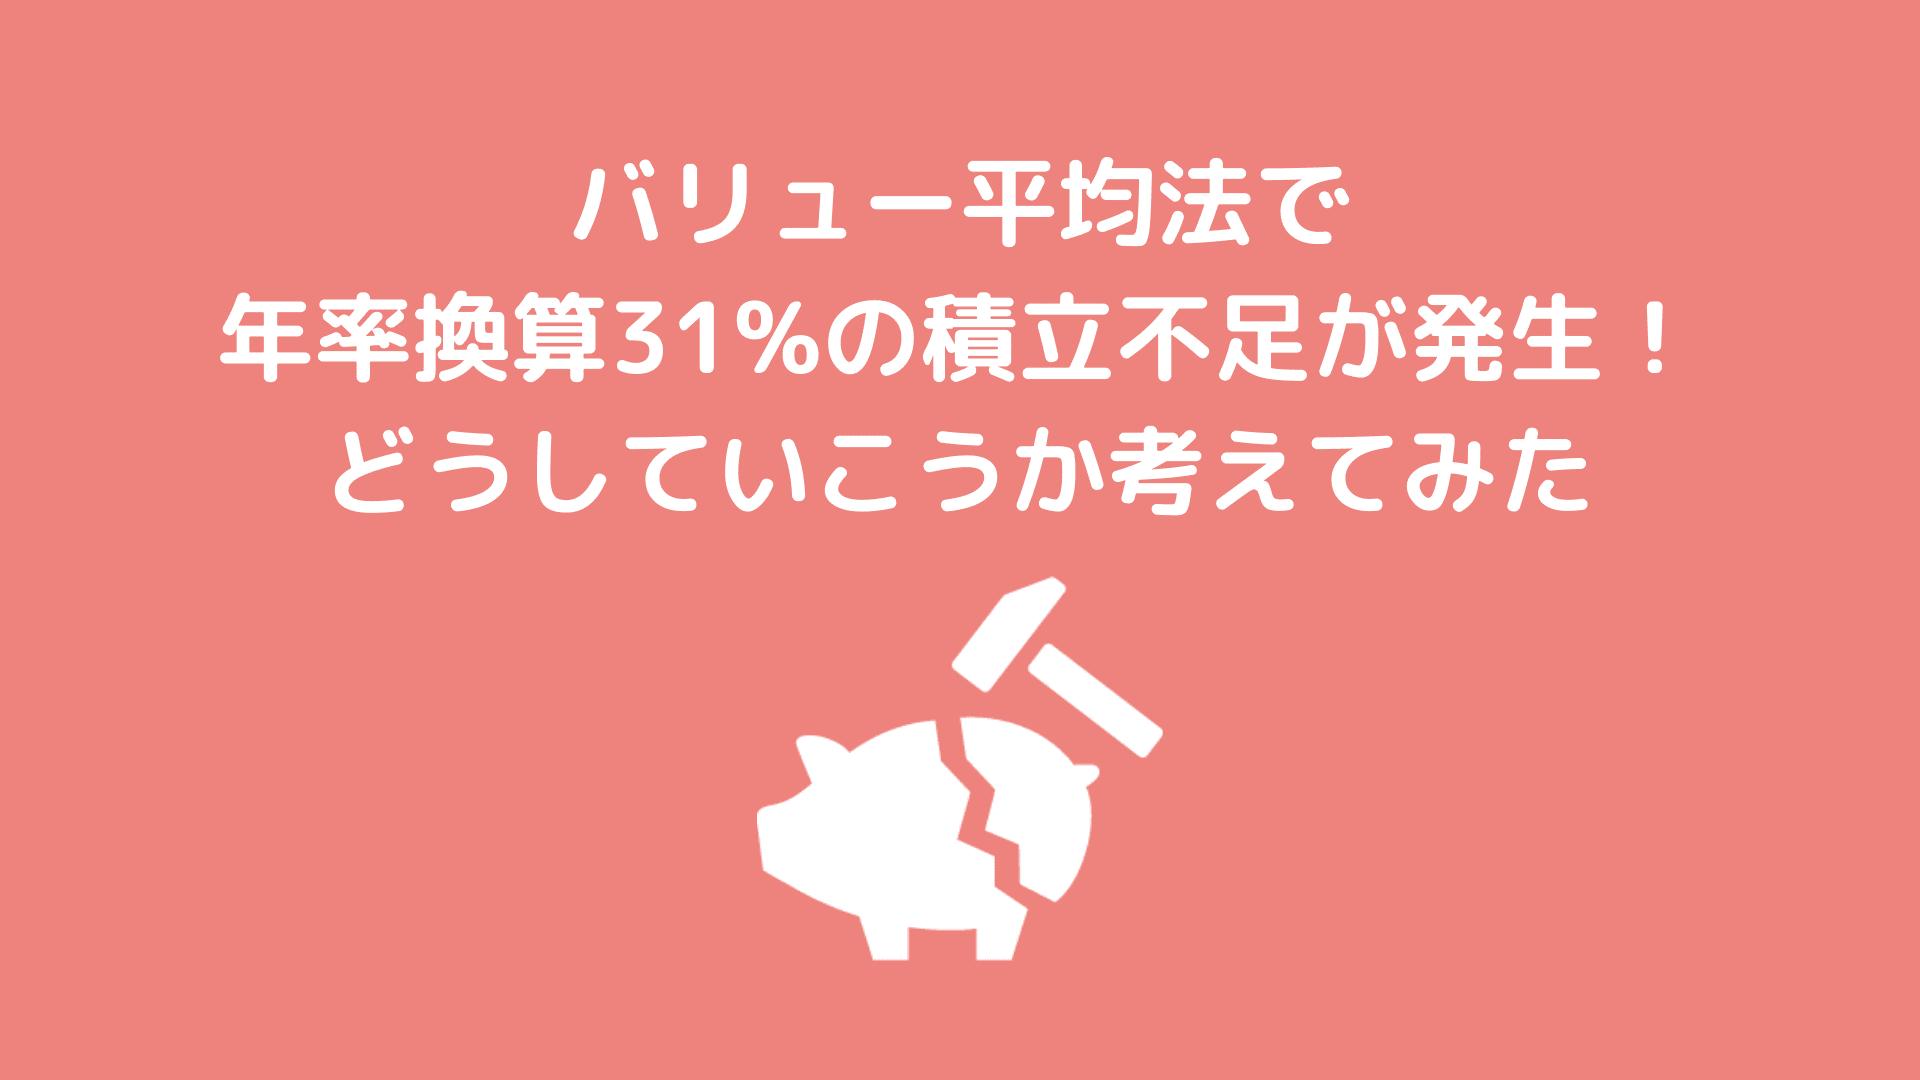 0001 5332516630